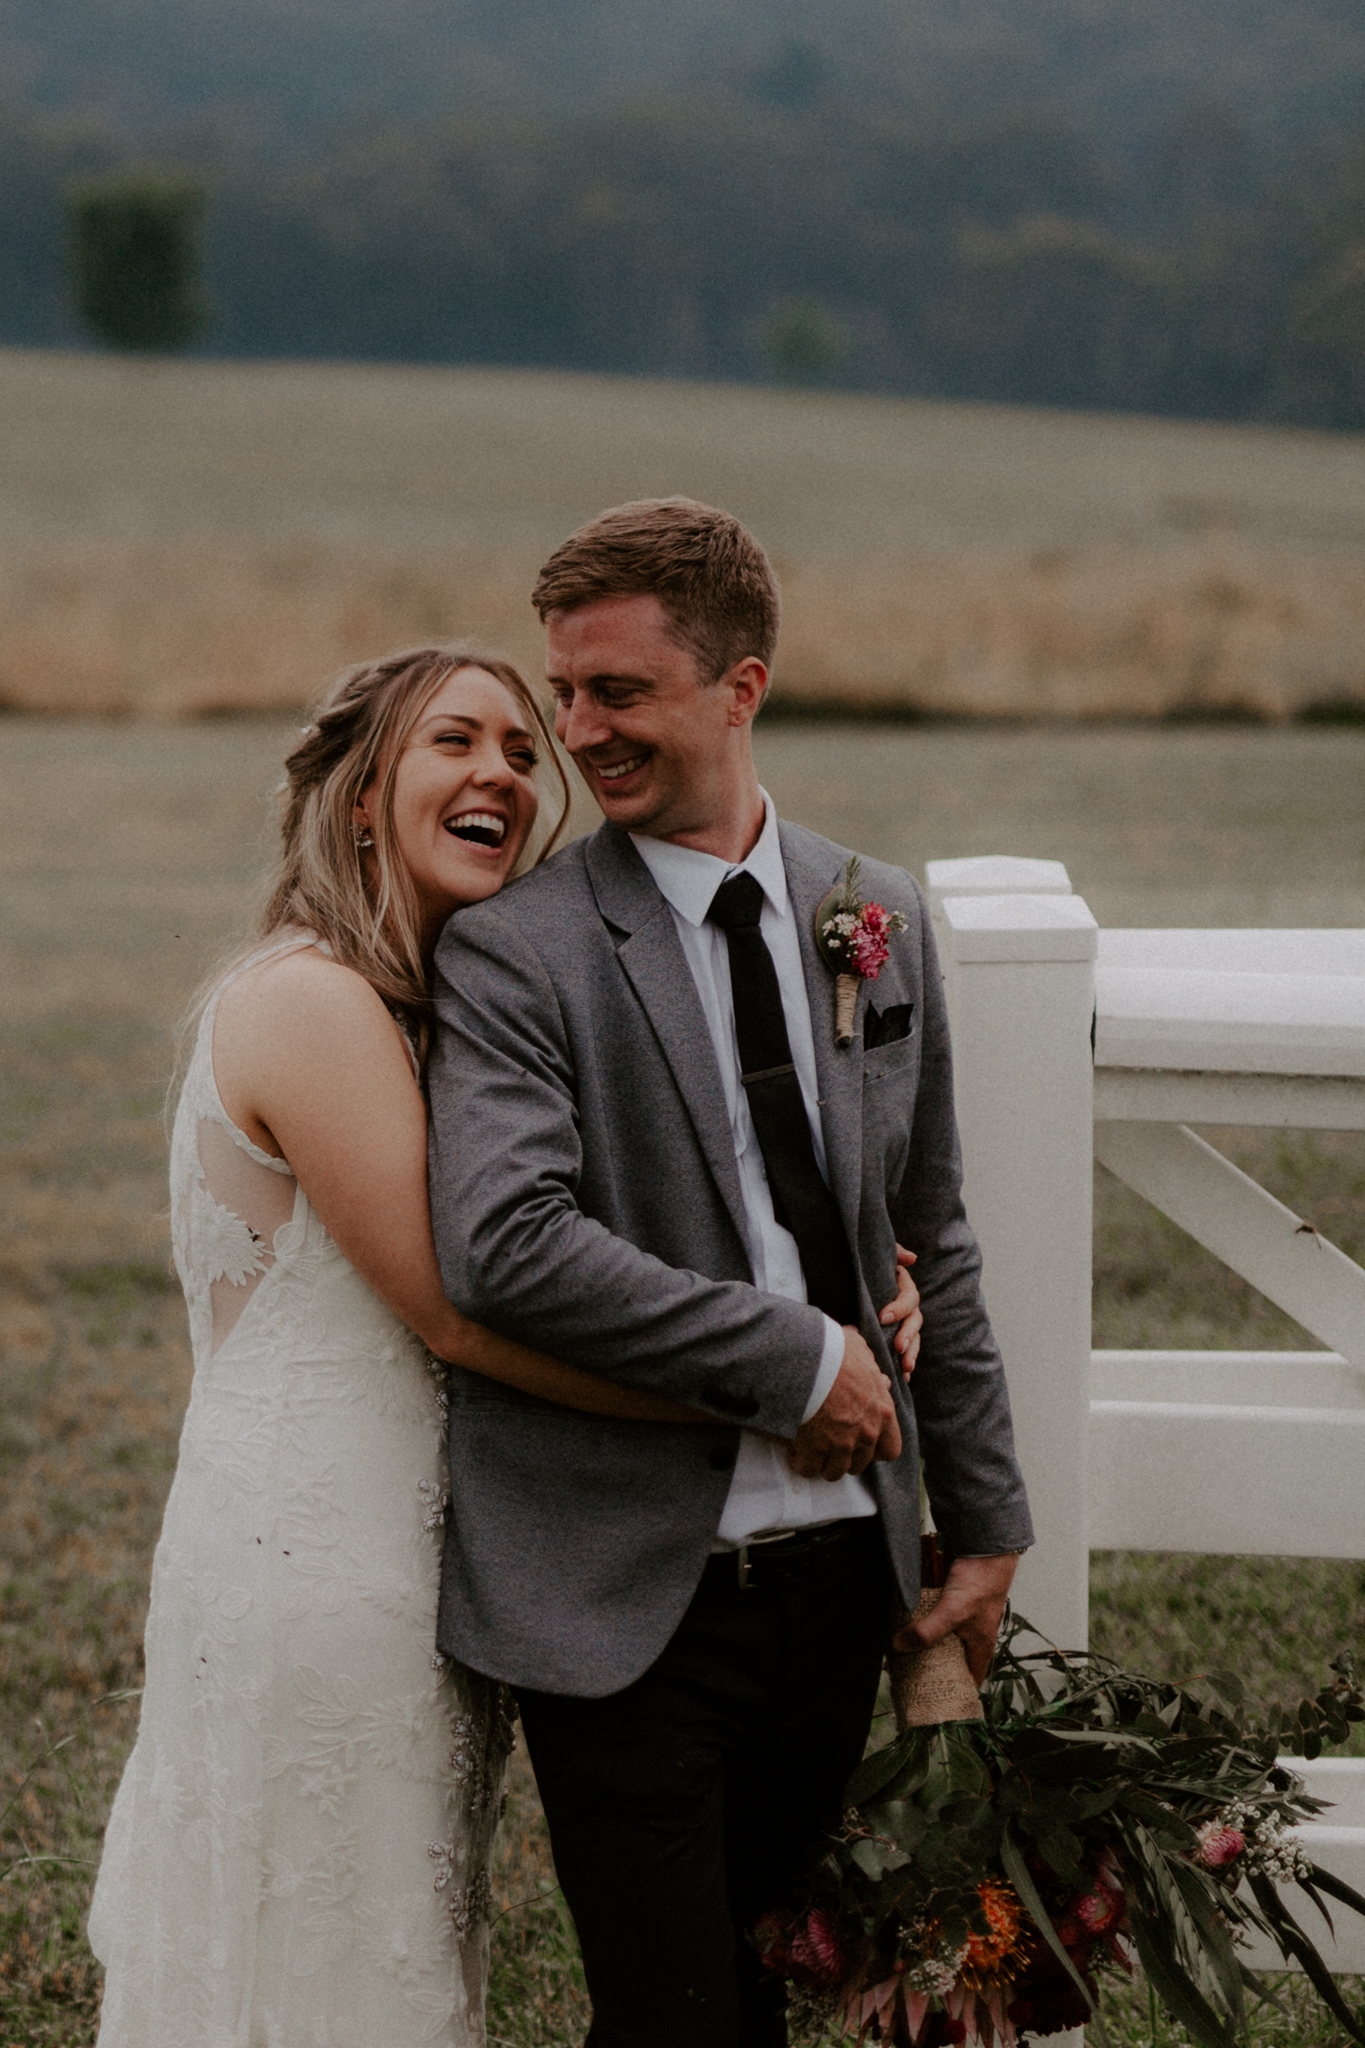 Wandin-Park-Estate-Wedding-Emotions-and-Math-Photography-135.jpg